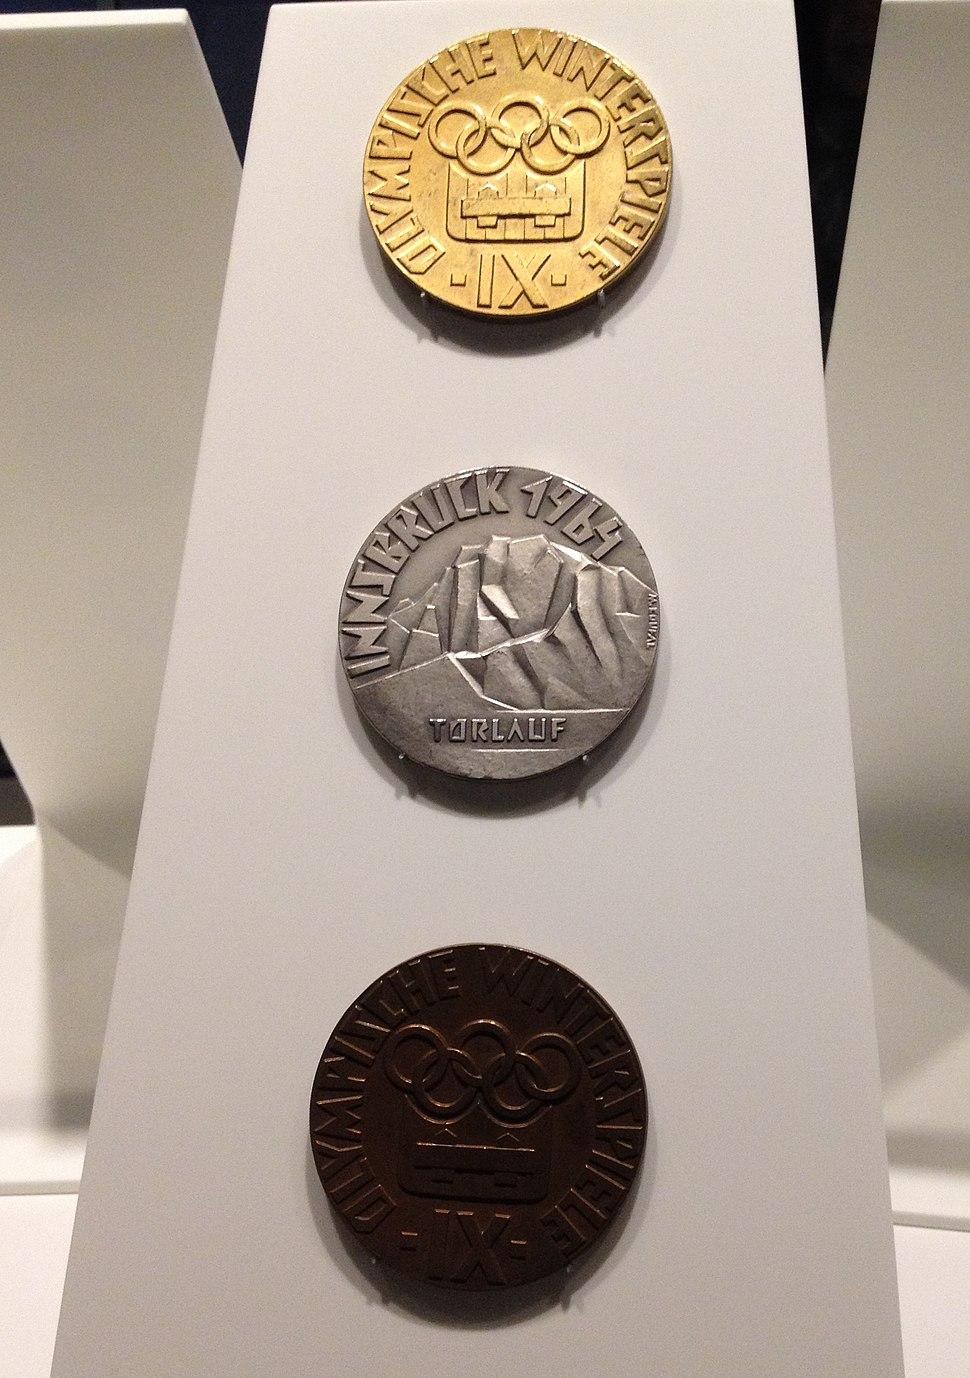 1964 Winter Olympics medals